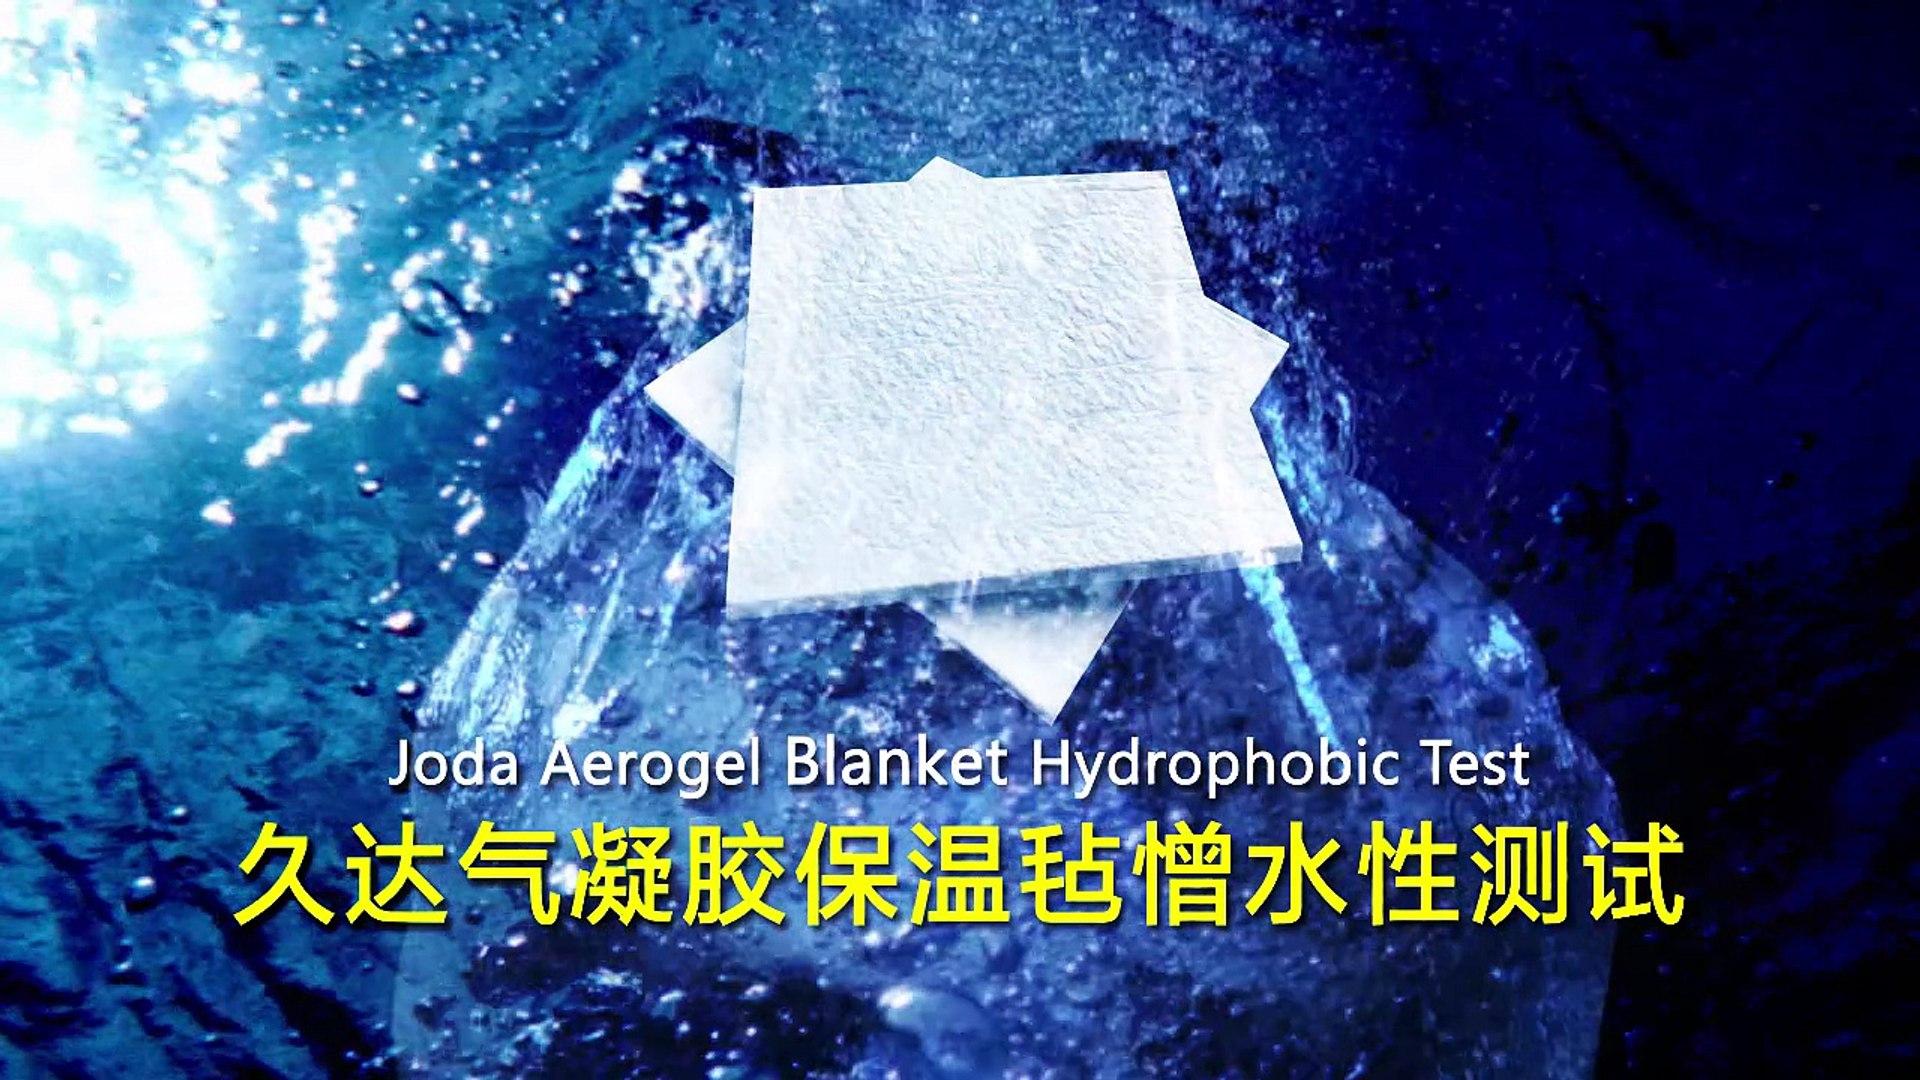 3mm Joda Aerogel blanket Hydrophobic Test